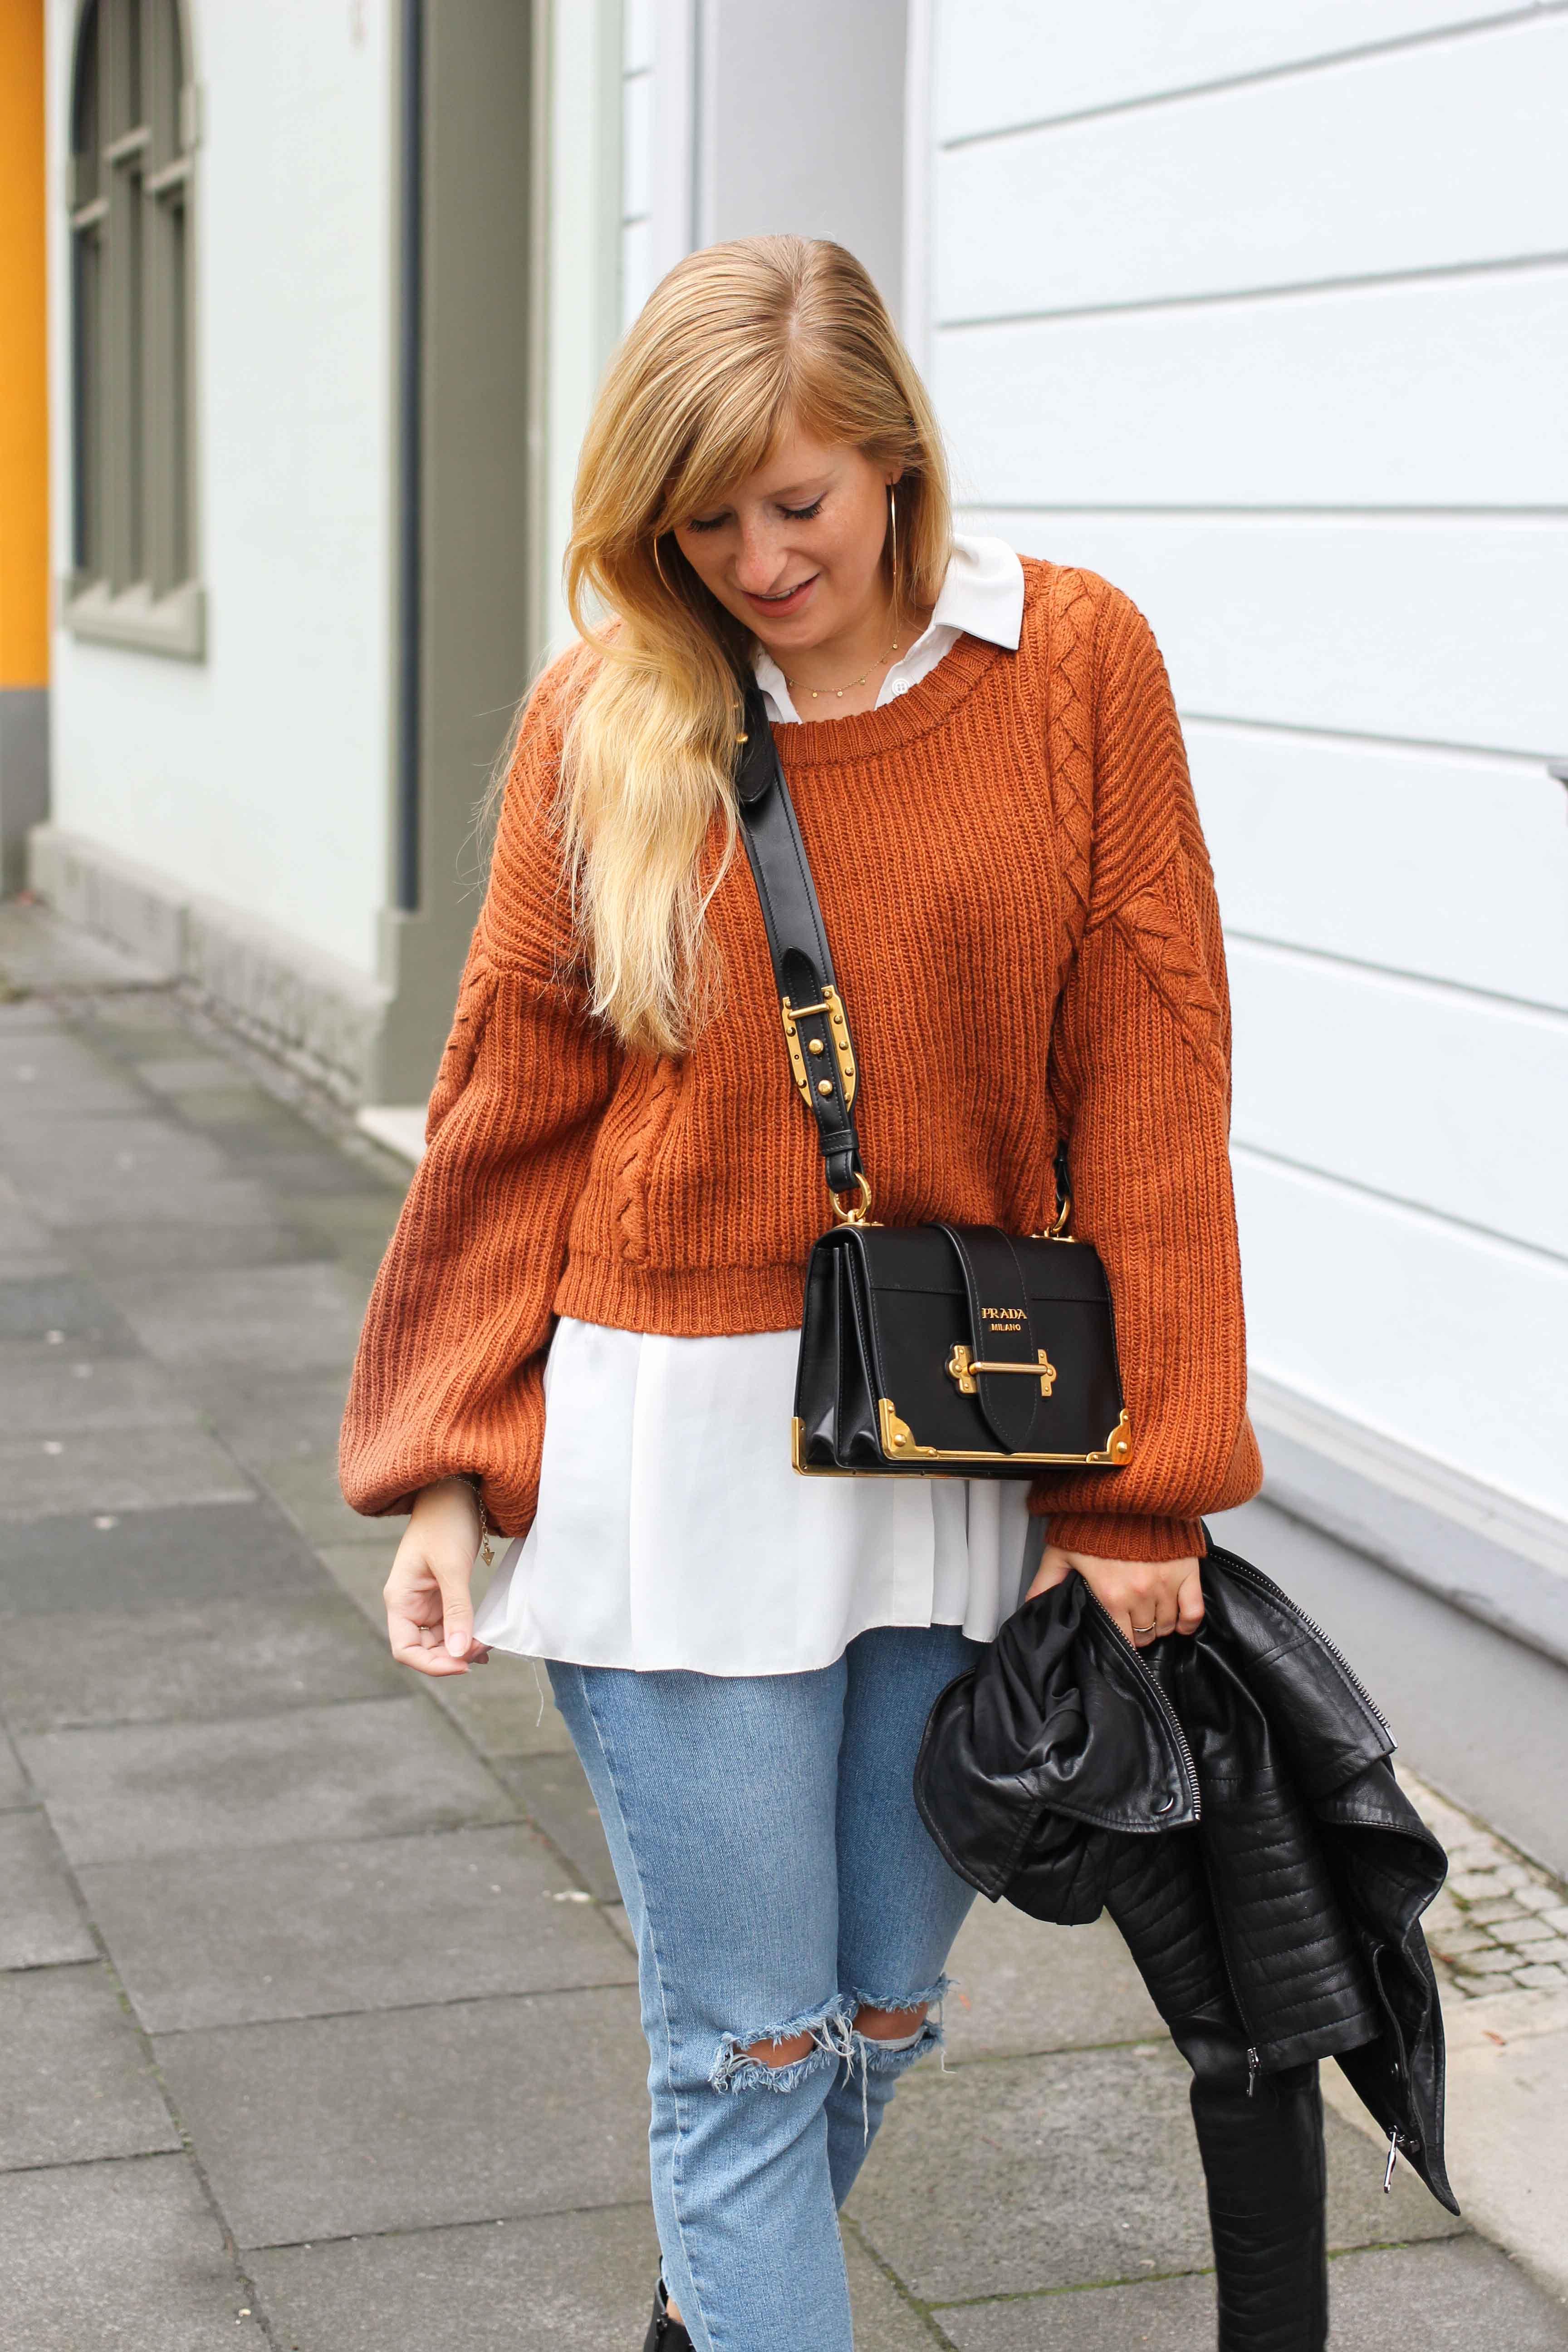 Übergangslook Crop Wollpullover Layering Bluse kombinieren zerrissene Jeans Modeblog Outfit Streetstyle Köln 4